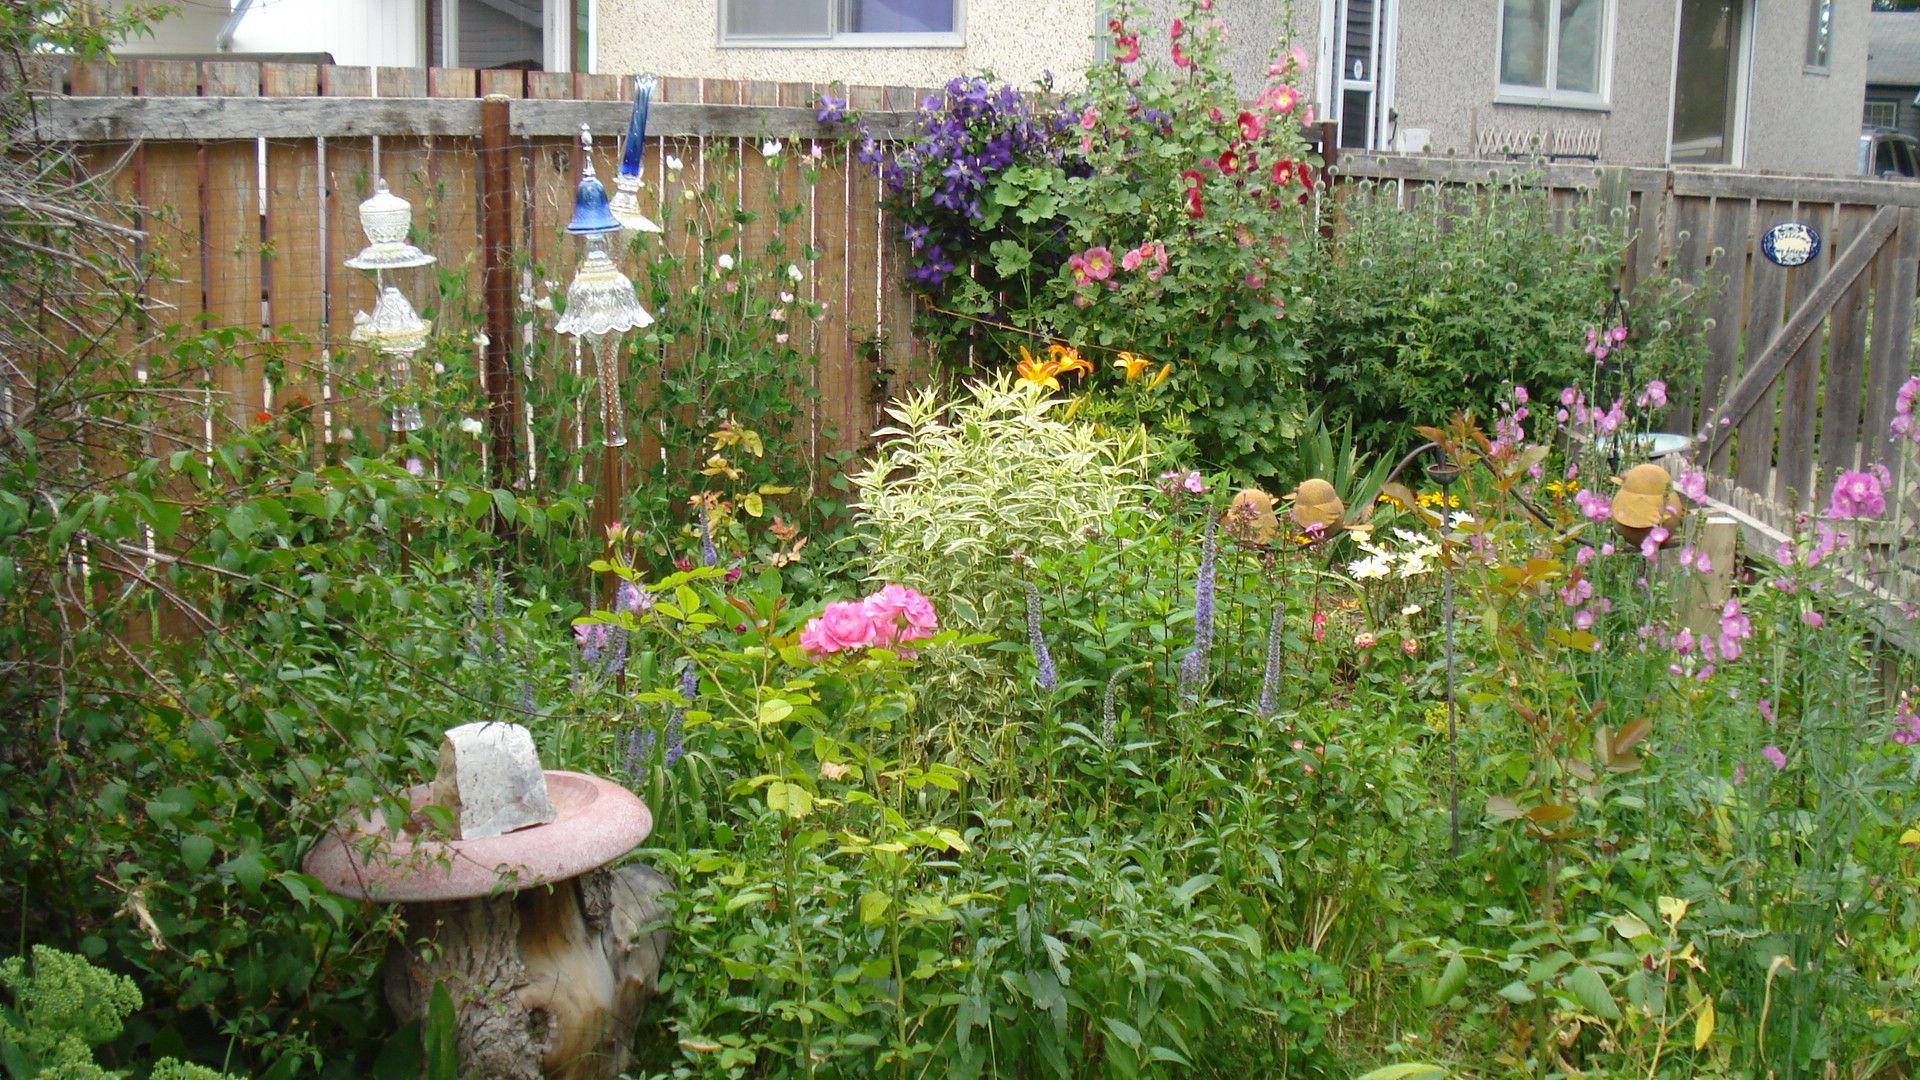 My little flower garden gardening ideas pinterest for Garden design pinterest